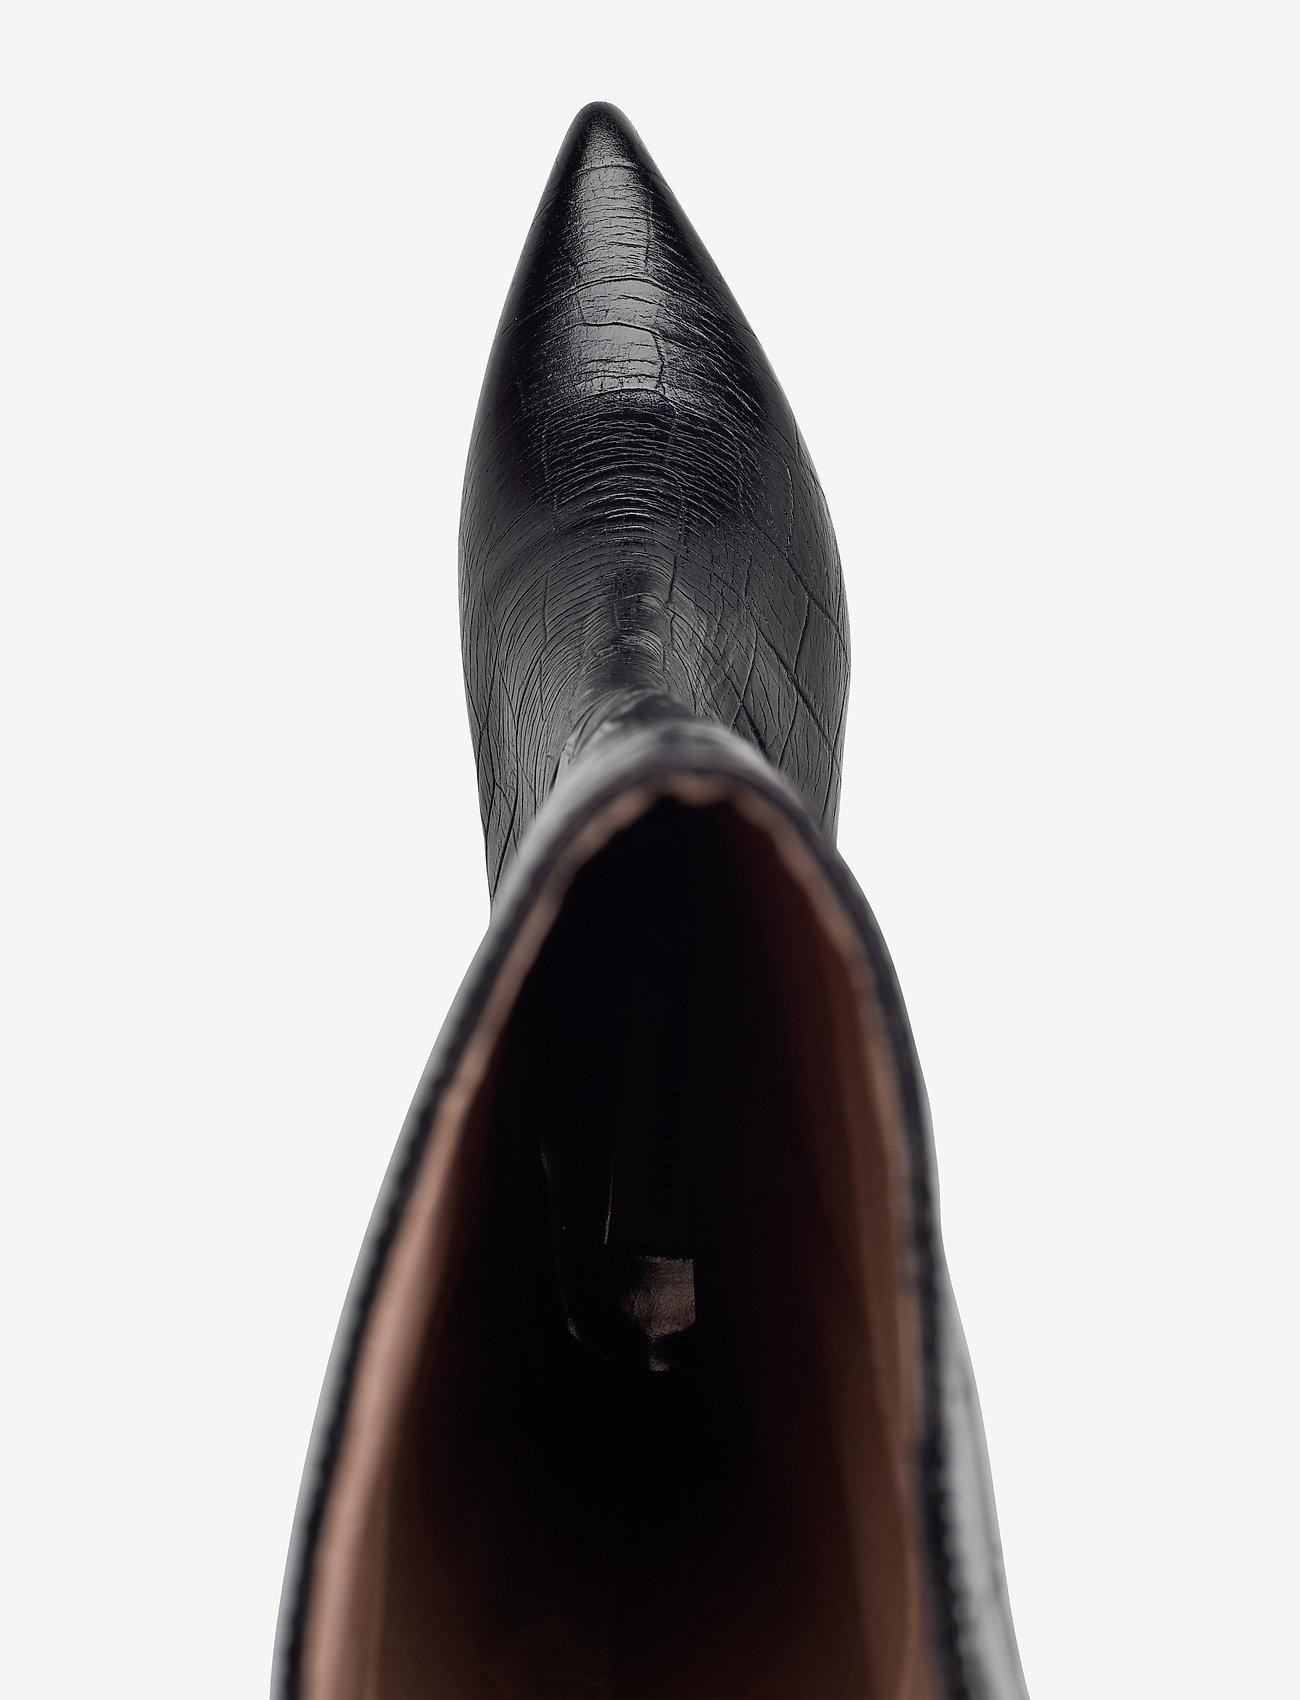 Alia Croco (Anthracite Black) (399 €) - Custommade erBOG